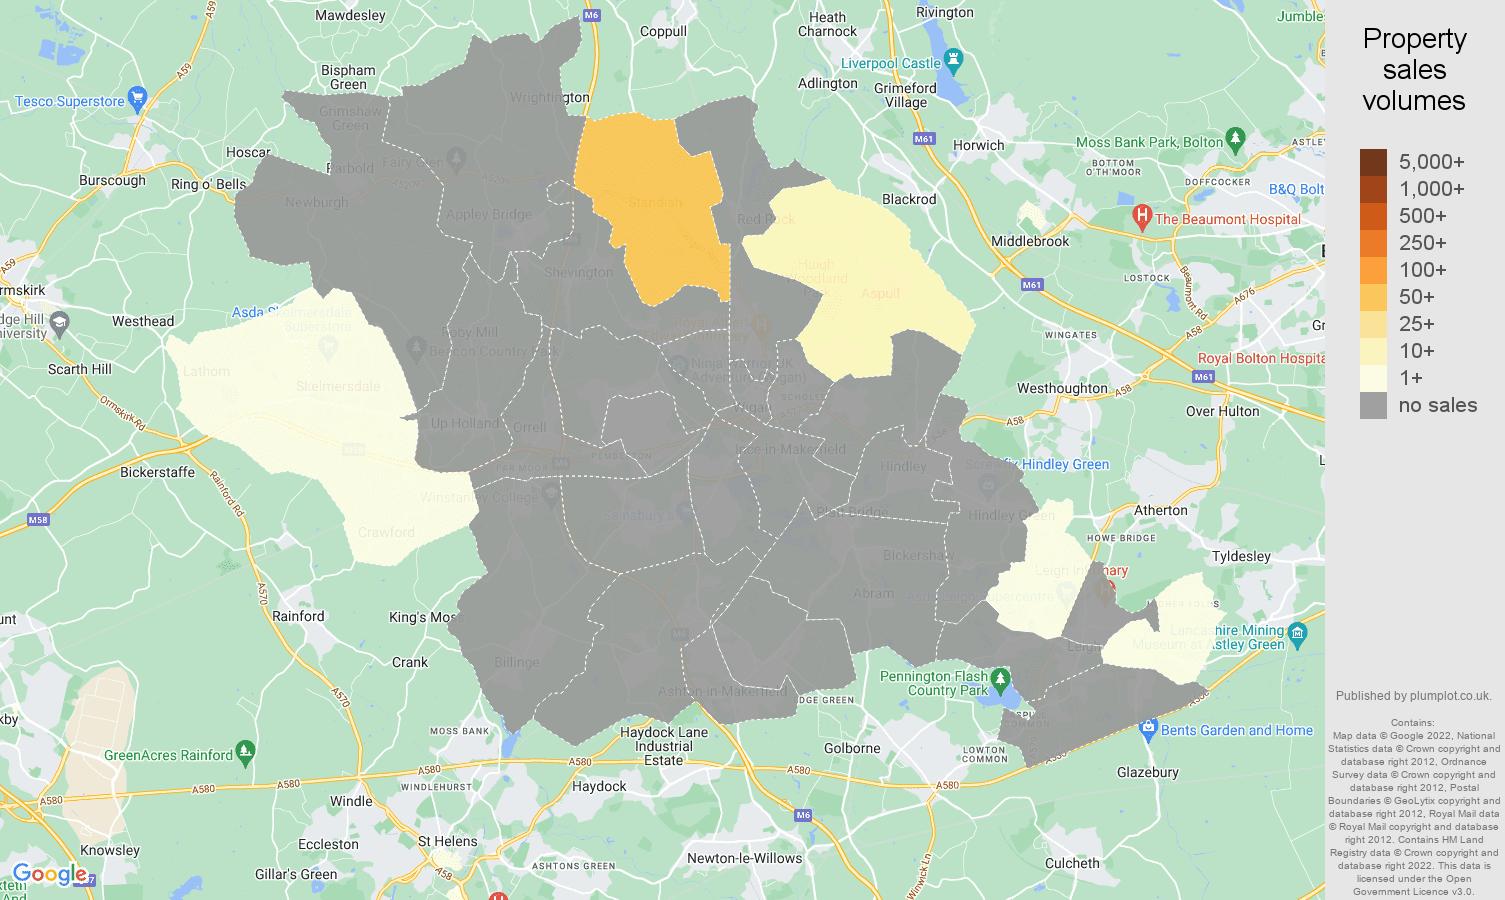 Wigan map of sales of new properties